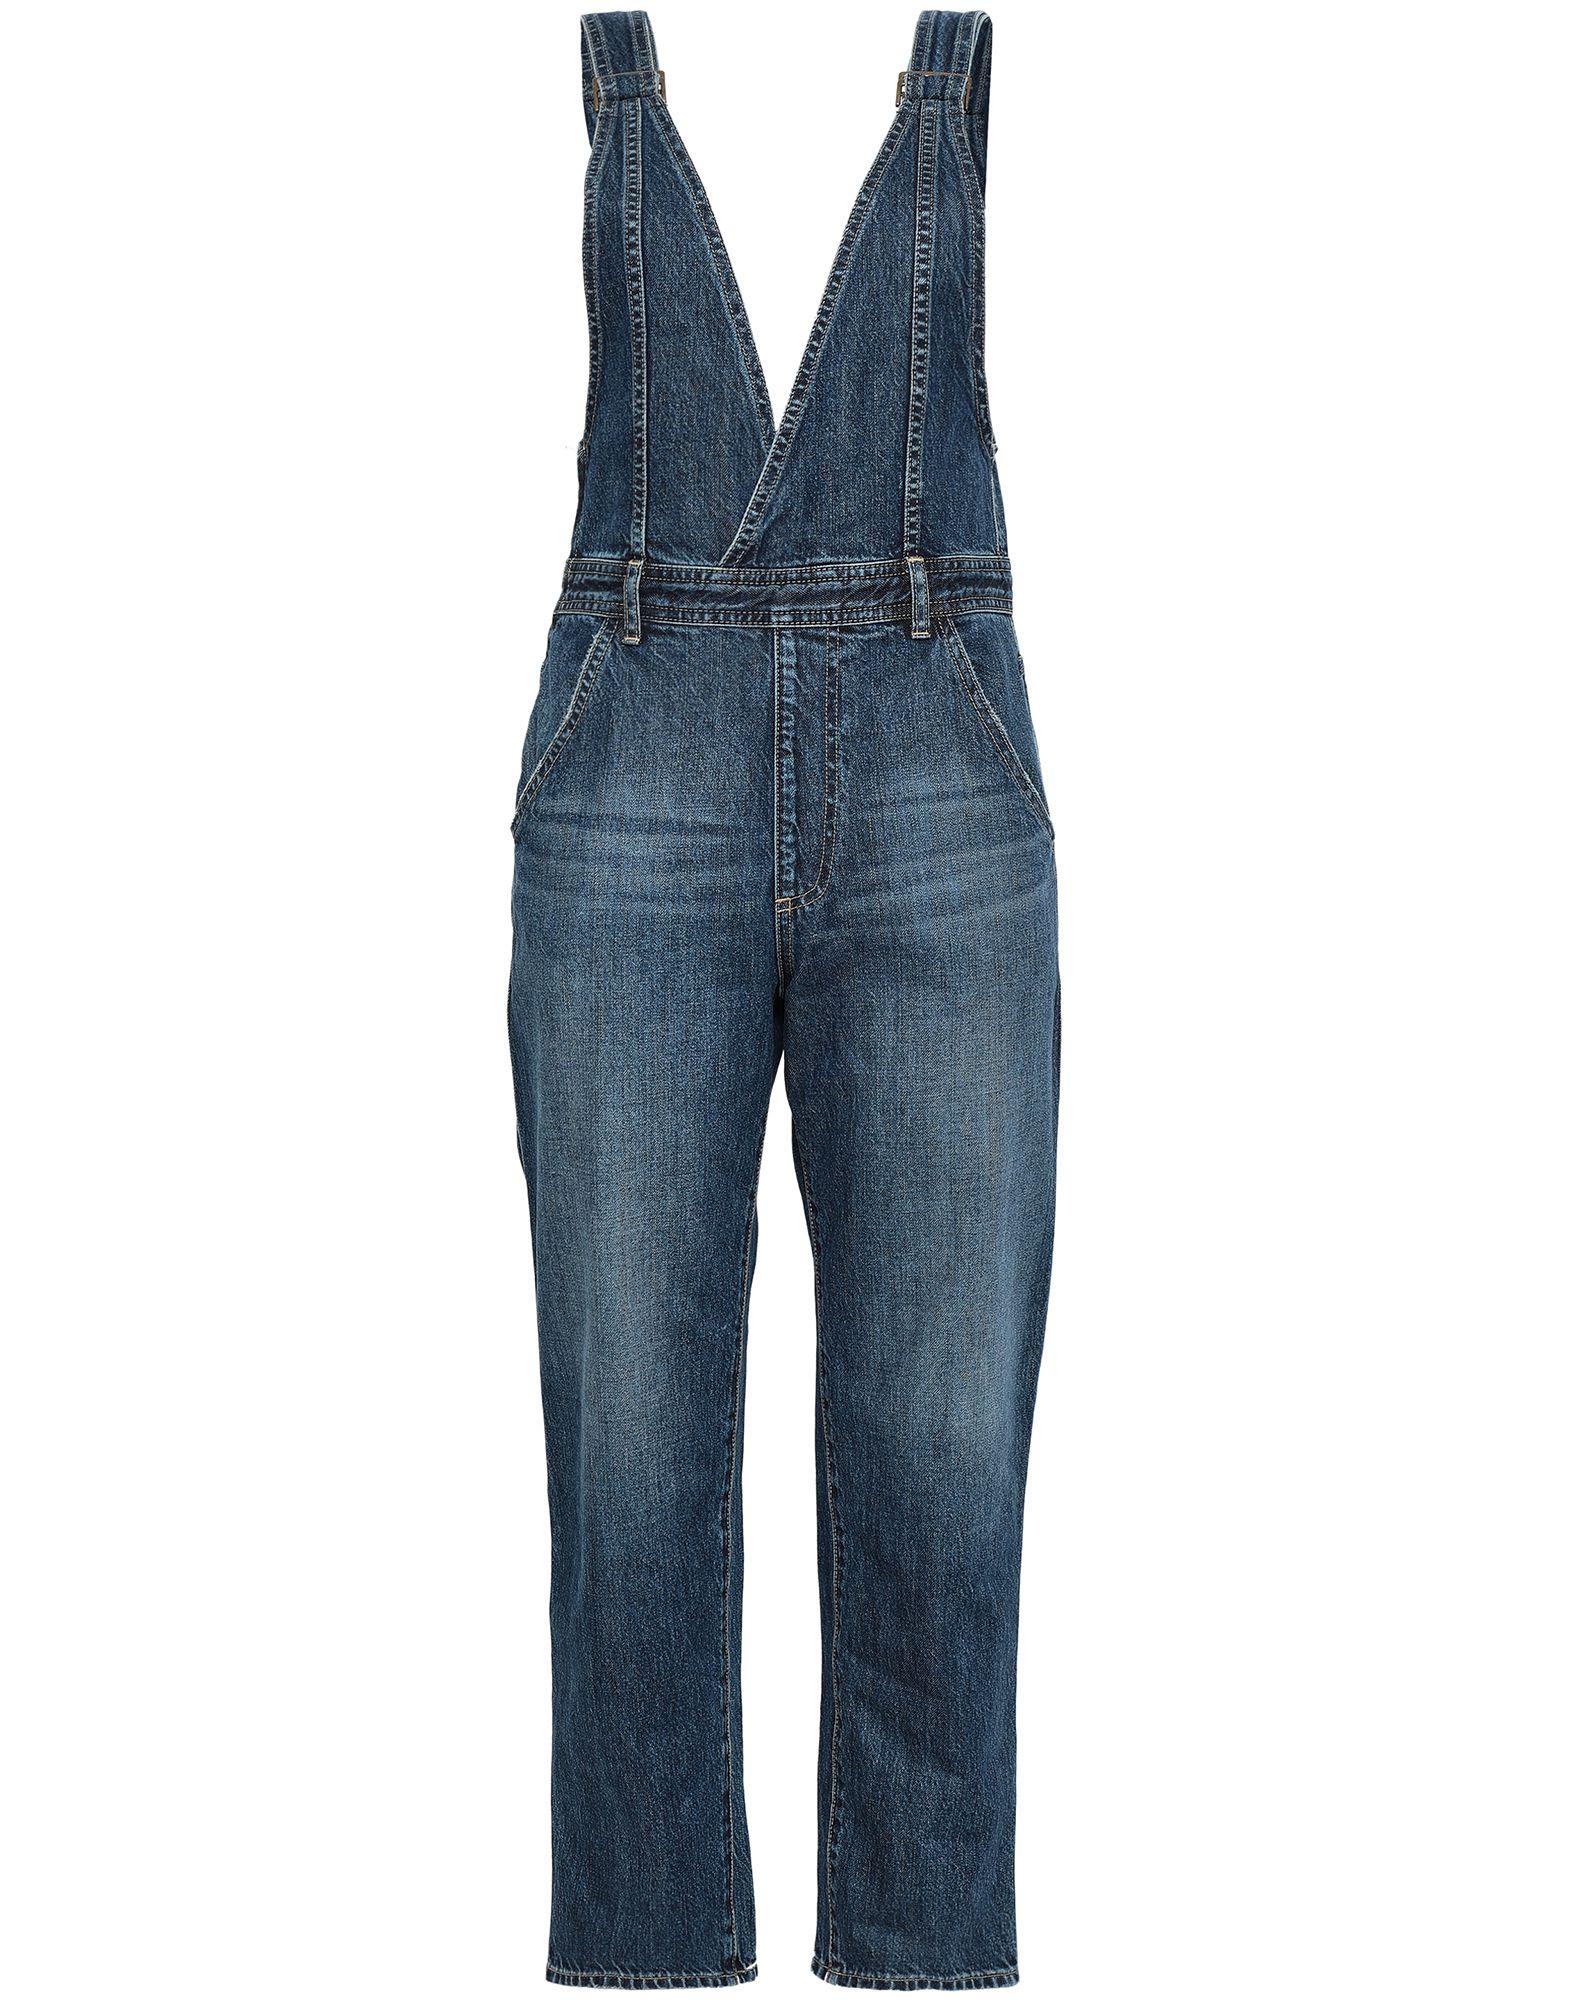 AG JEANS Комбинезоны без бретелей calvin klein jeans комбинезоны без бретелей